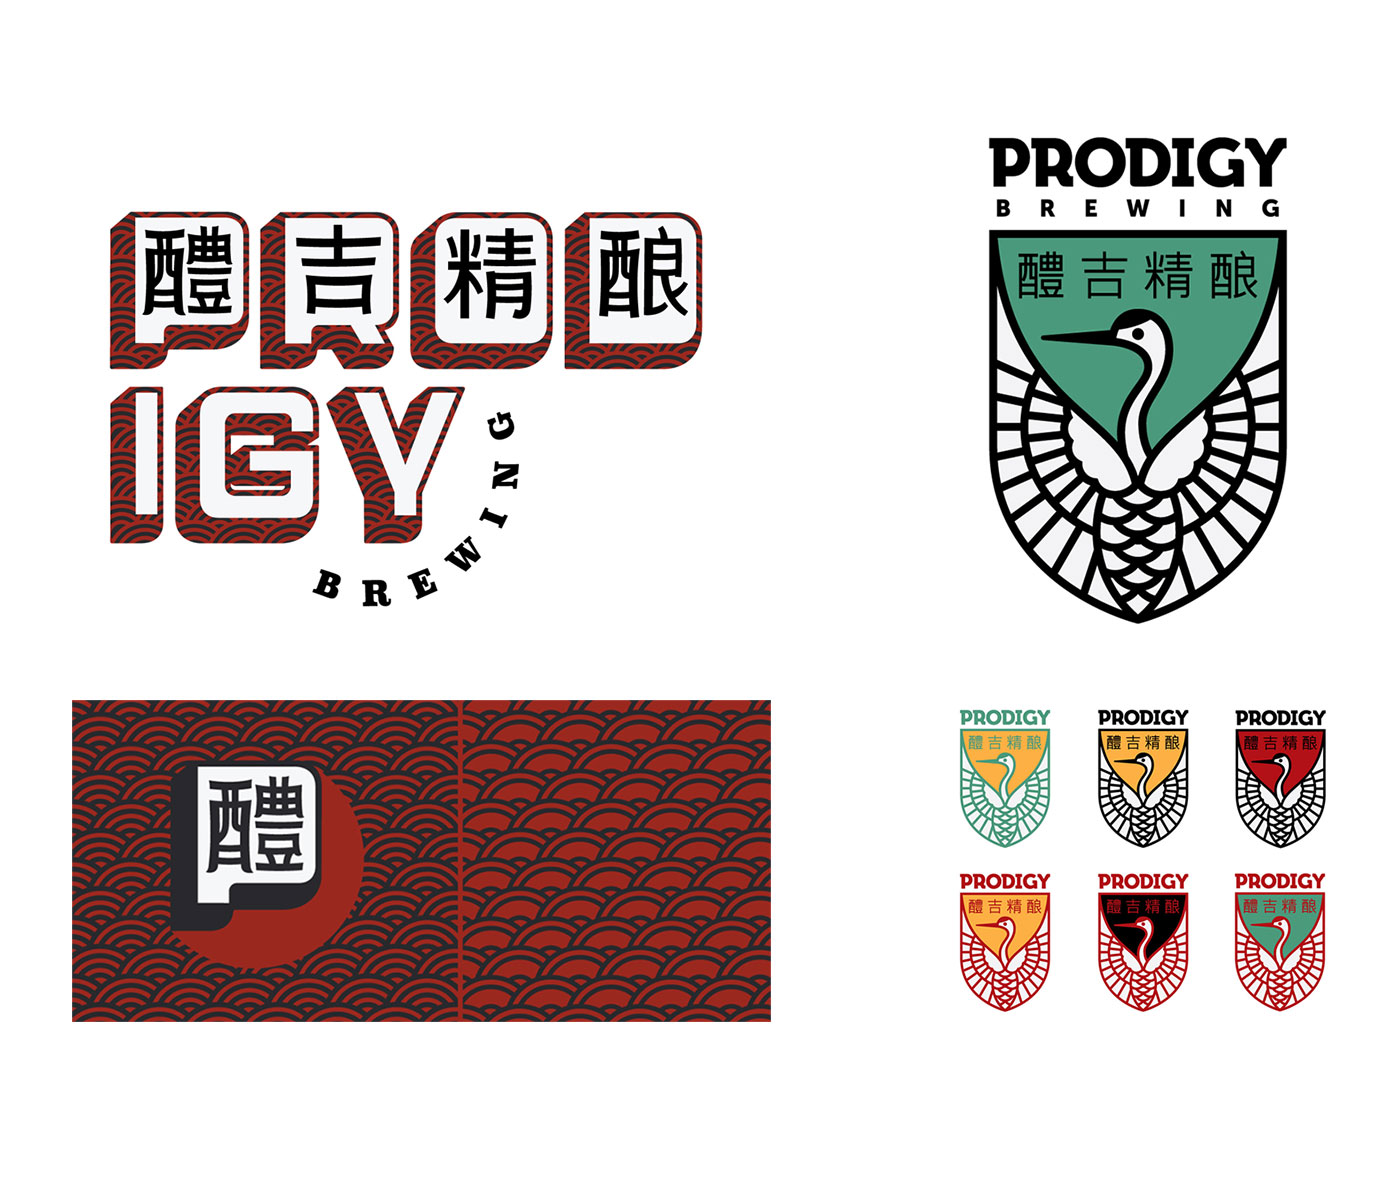 Prodigy Brewing logo options